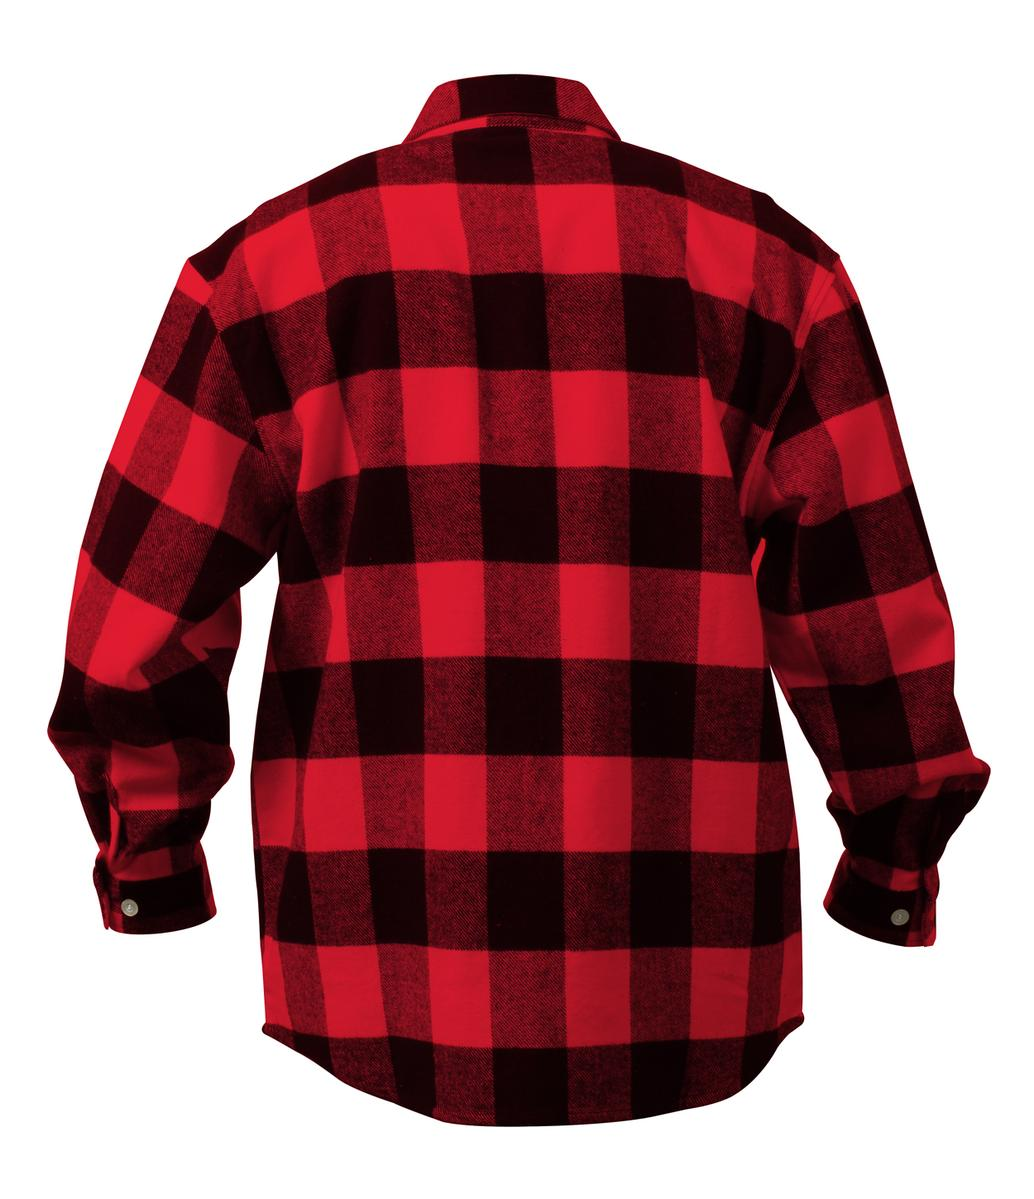 Extra heavyweight brawny flannel shirt buffalo plaid ebay for Buffalo check flannel shirt jacket